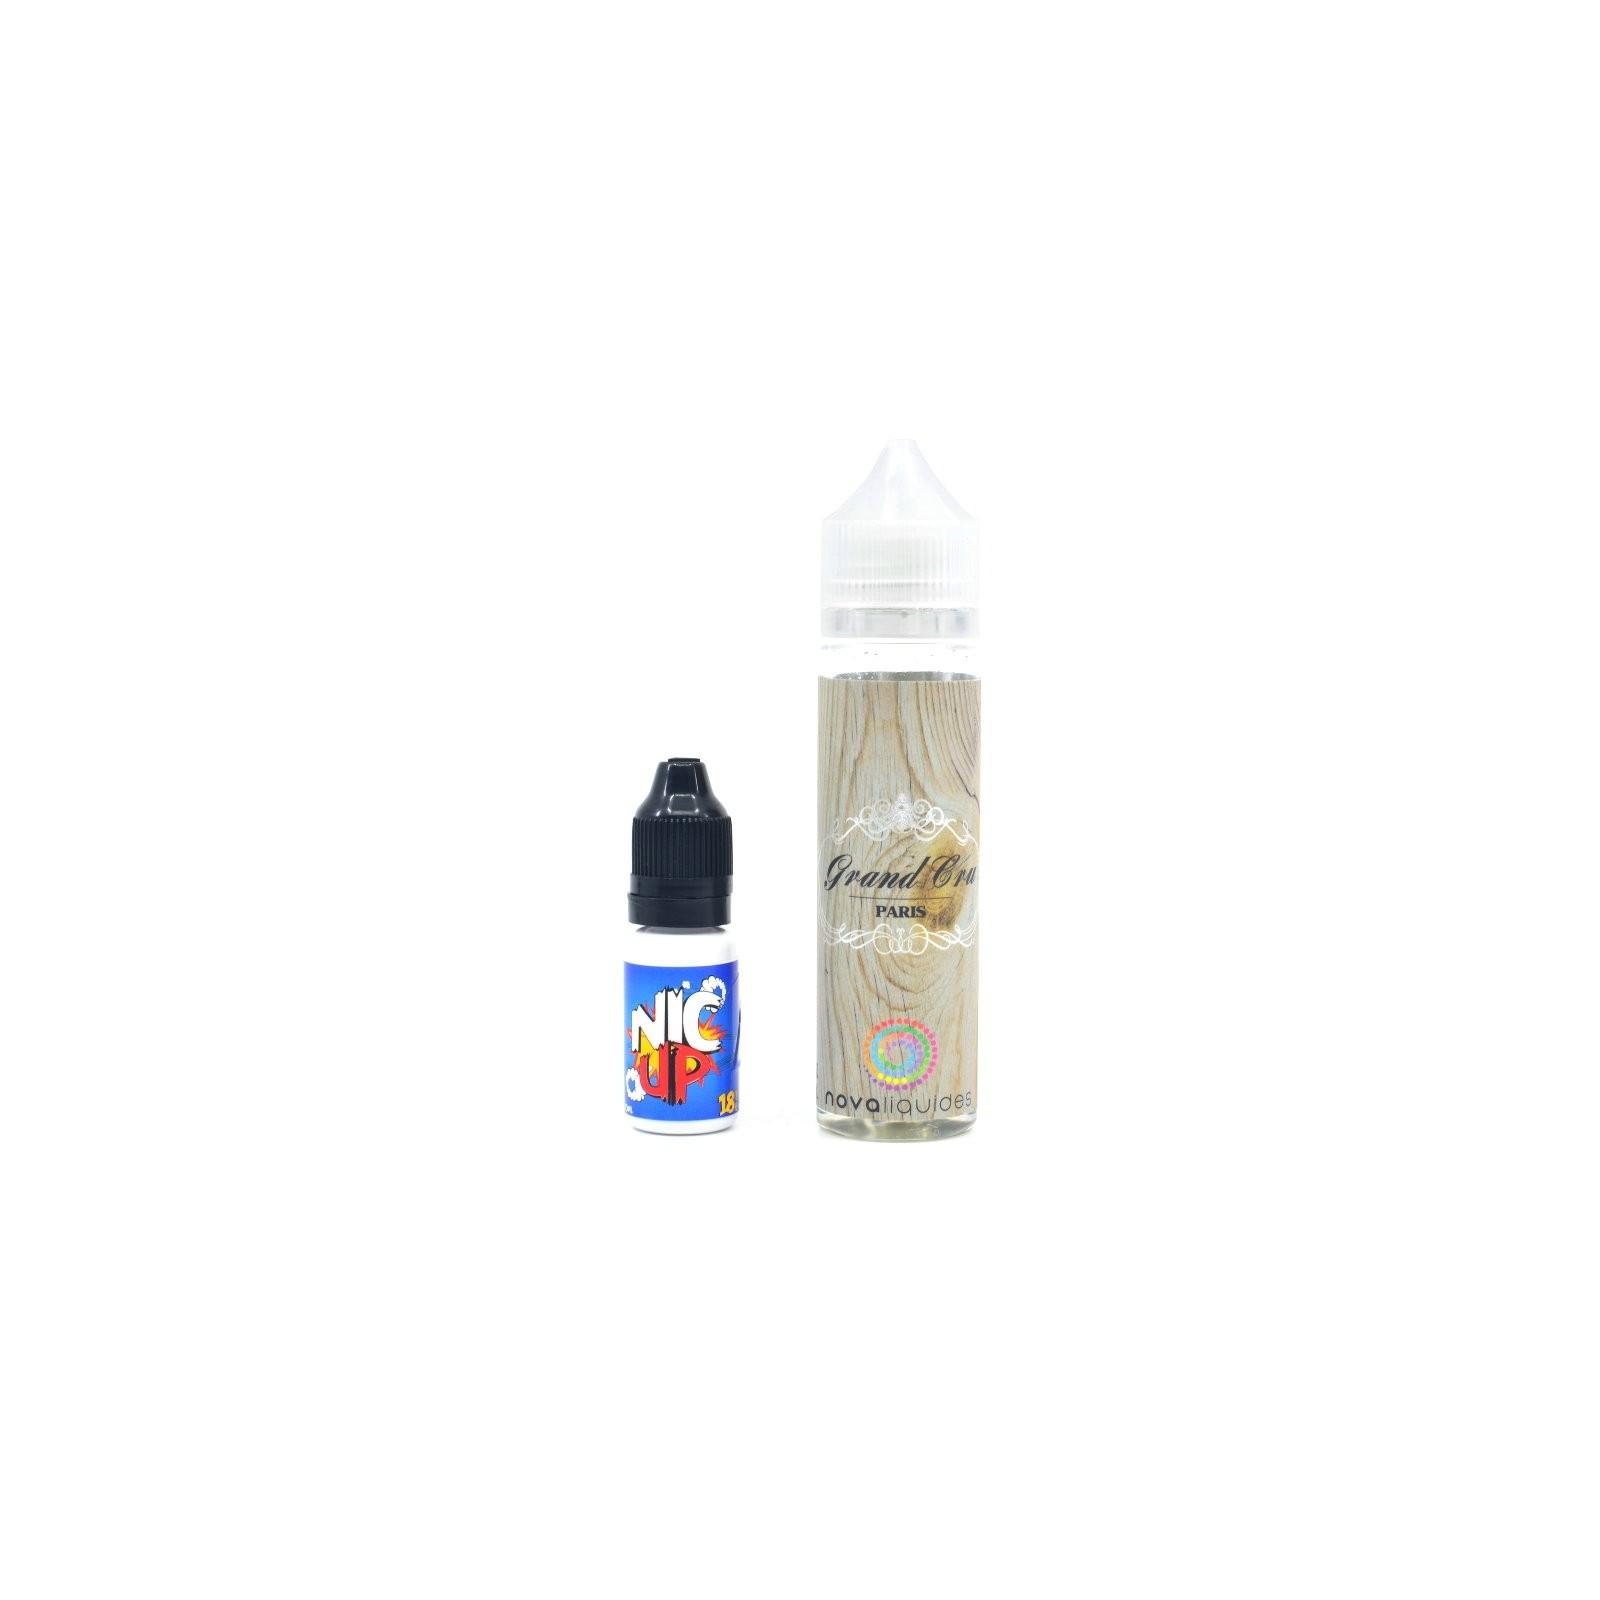 Grand Cru 50 ml - Nova Liquides